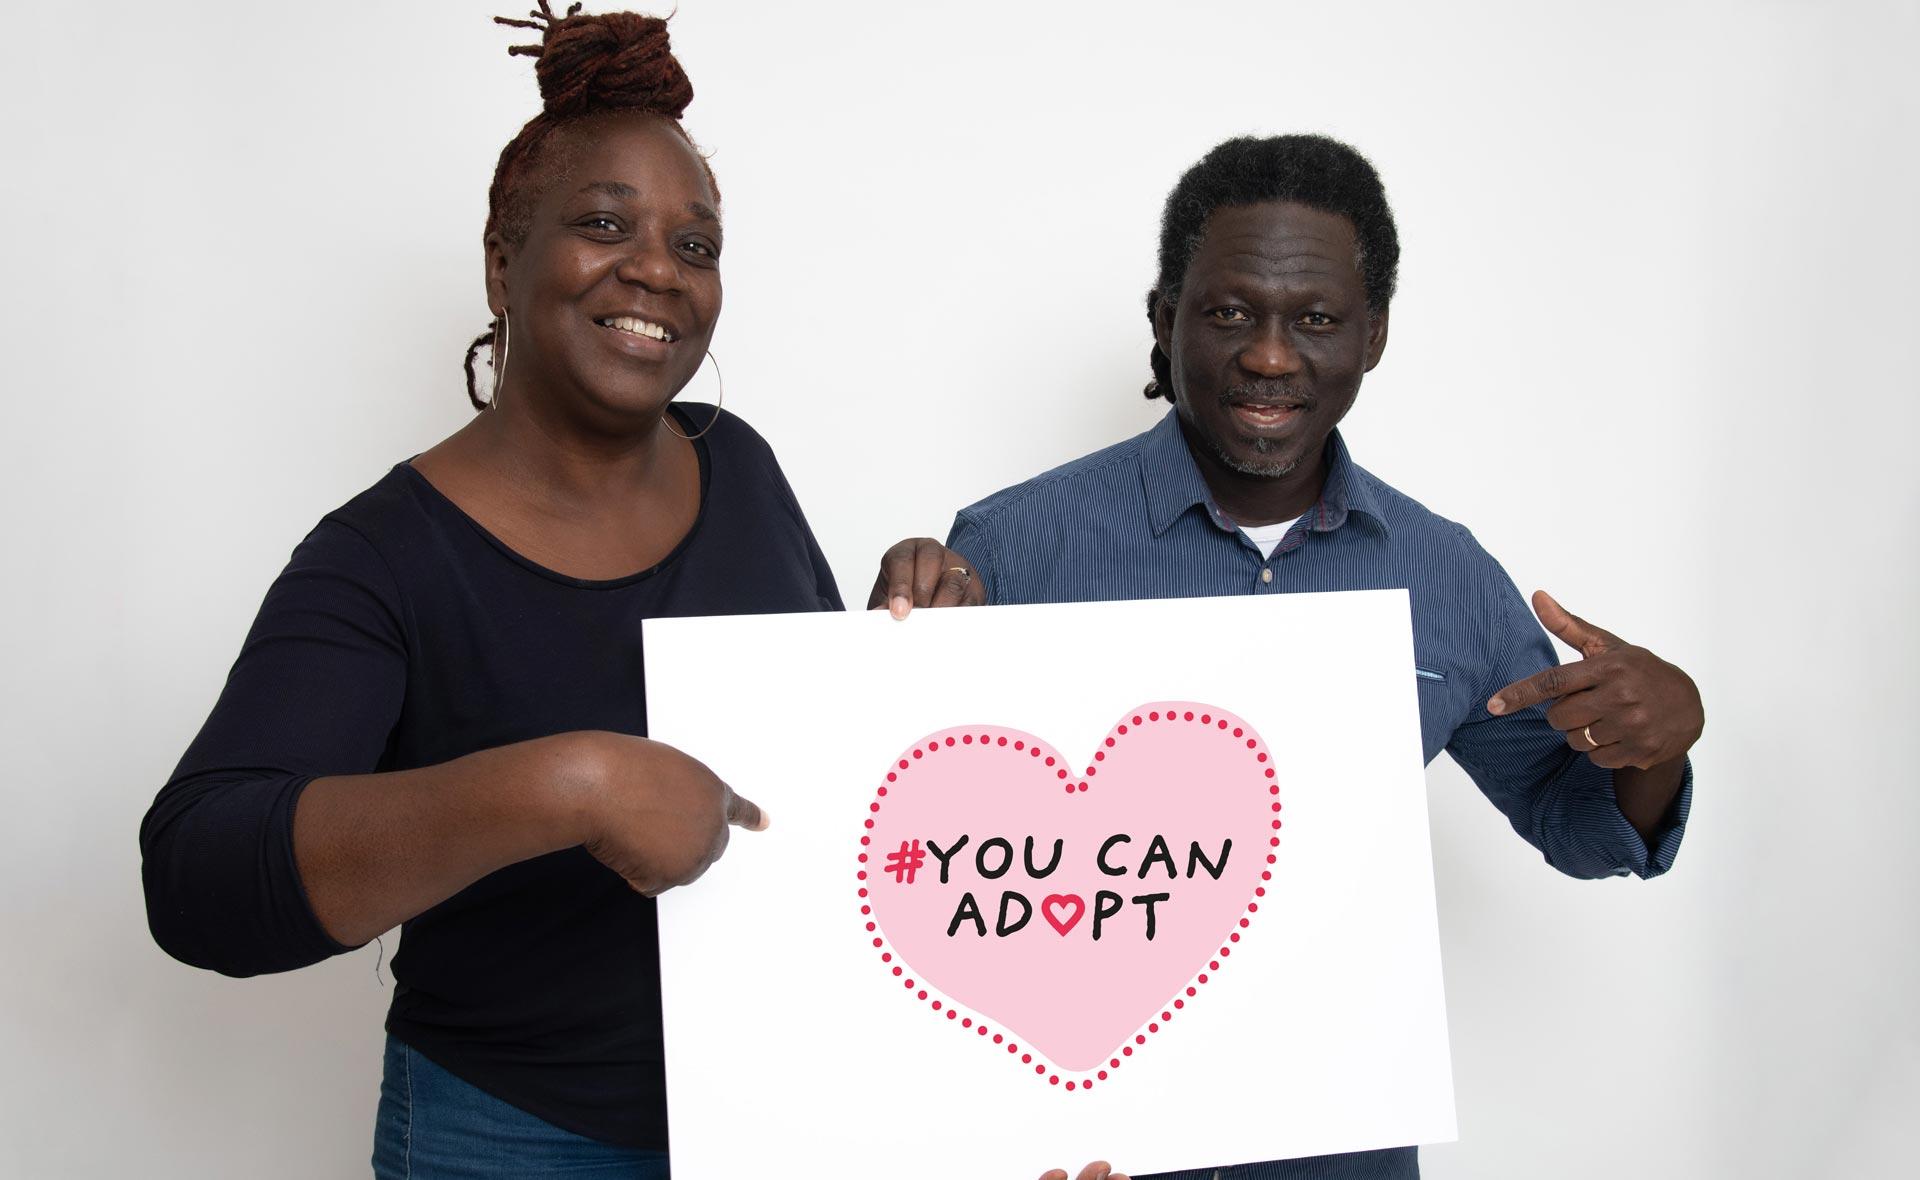 Carol's adoption story